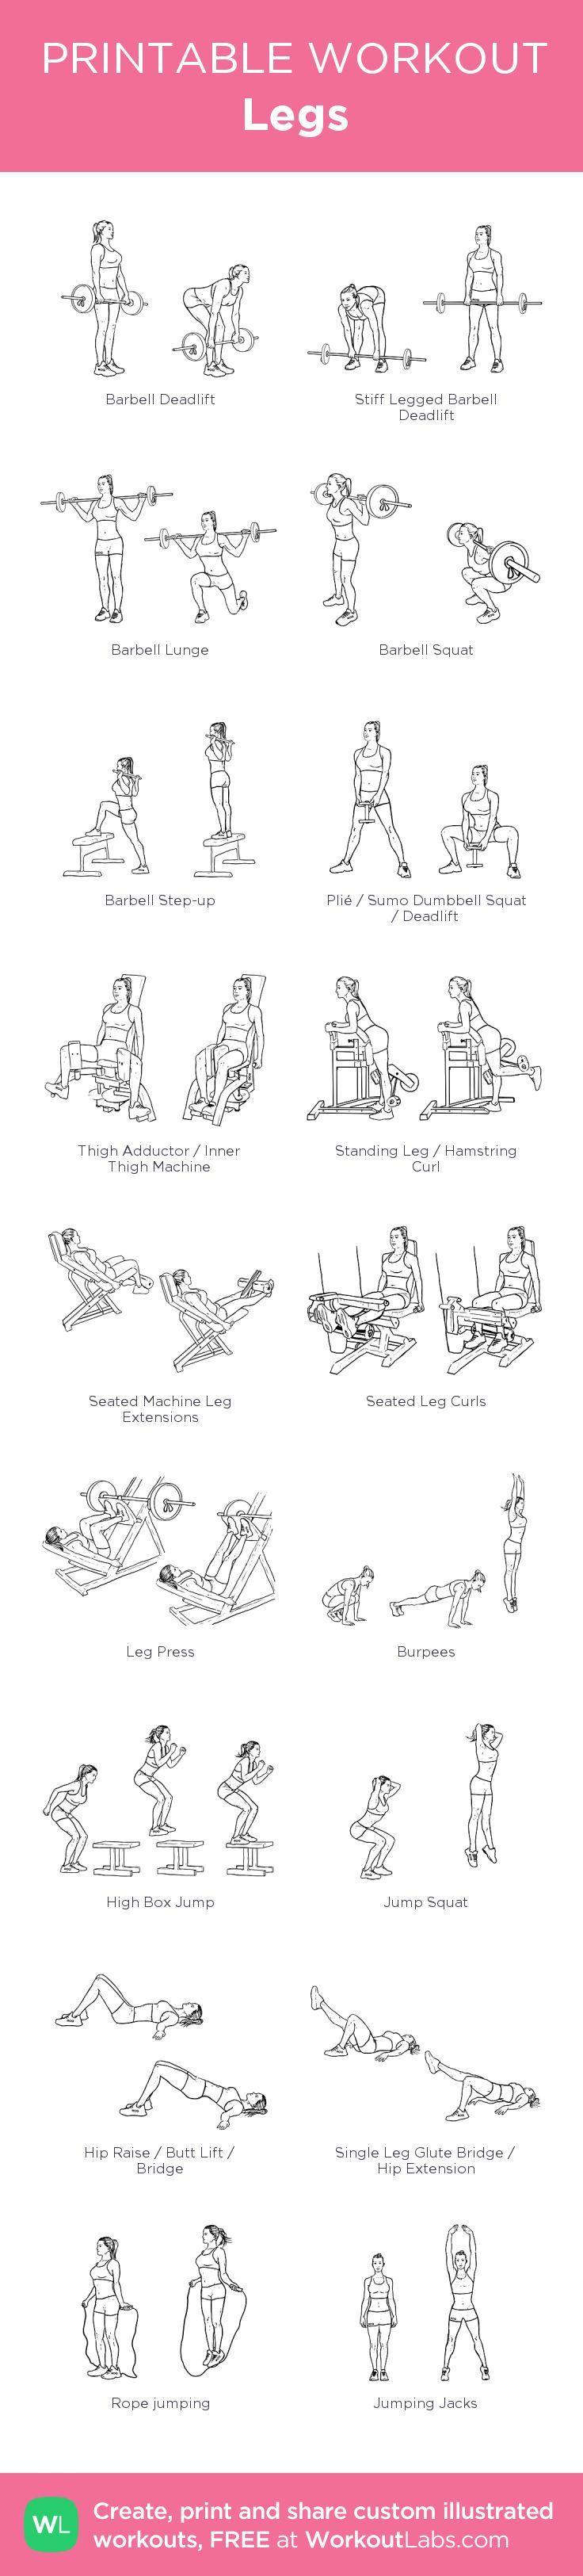 Legs: my custom printable workout by @WorkoutLabs #workoutlabs #customworkout